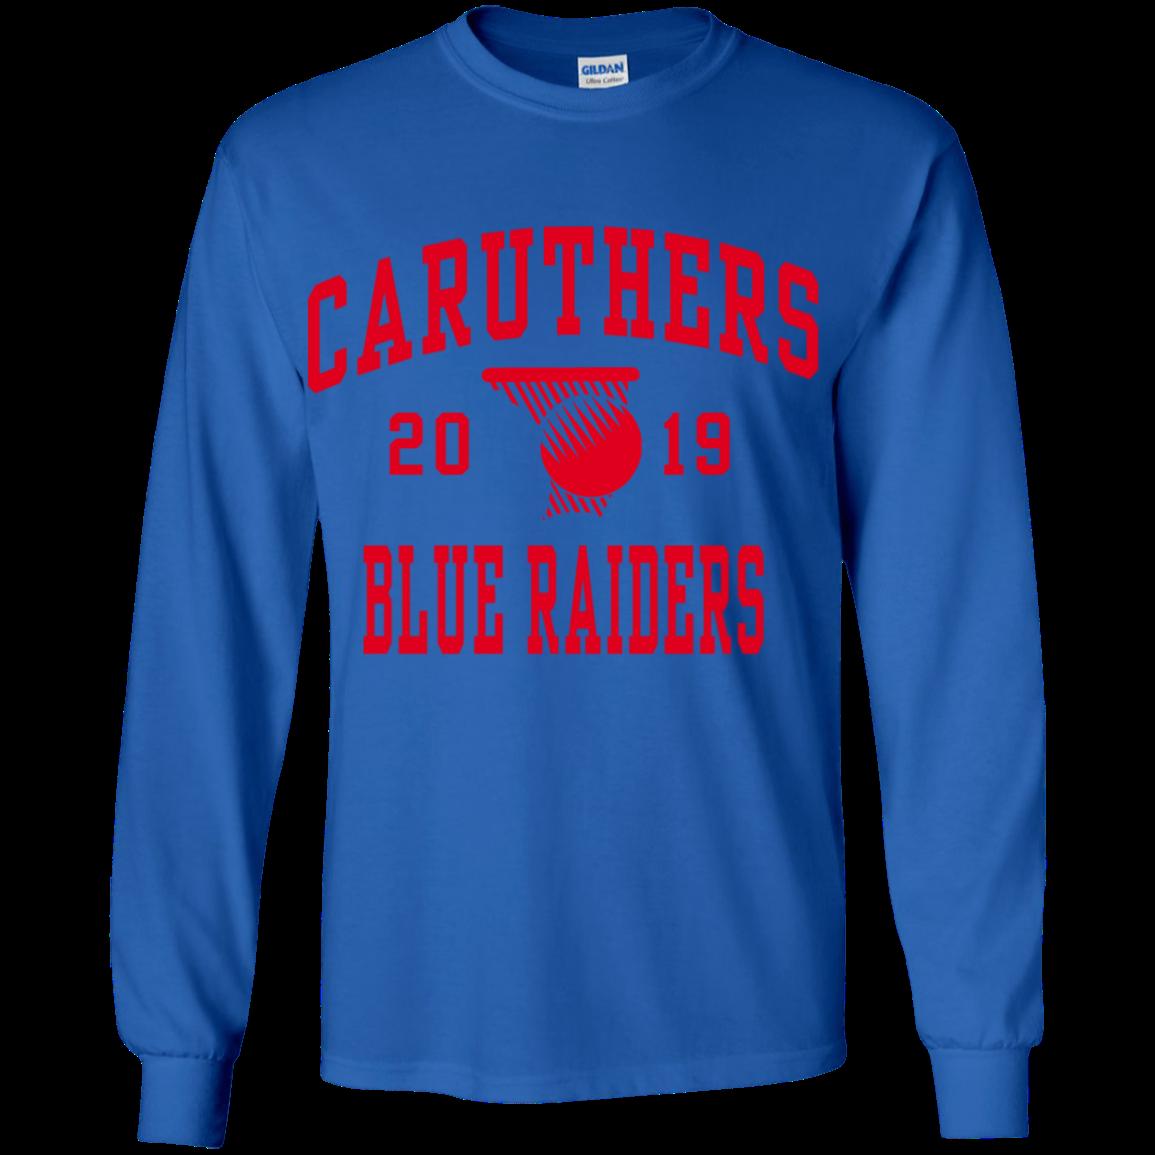 0ff66624 Caruthers High School Youth Long Sleeve Shirt - SpiritShop.com